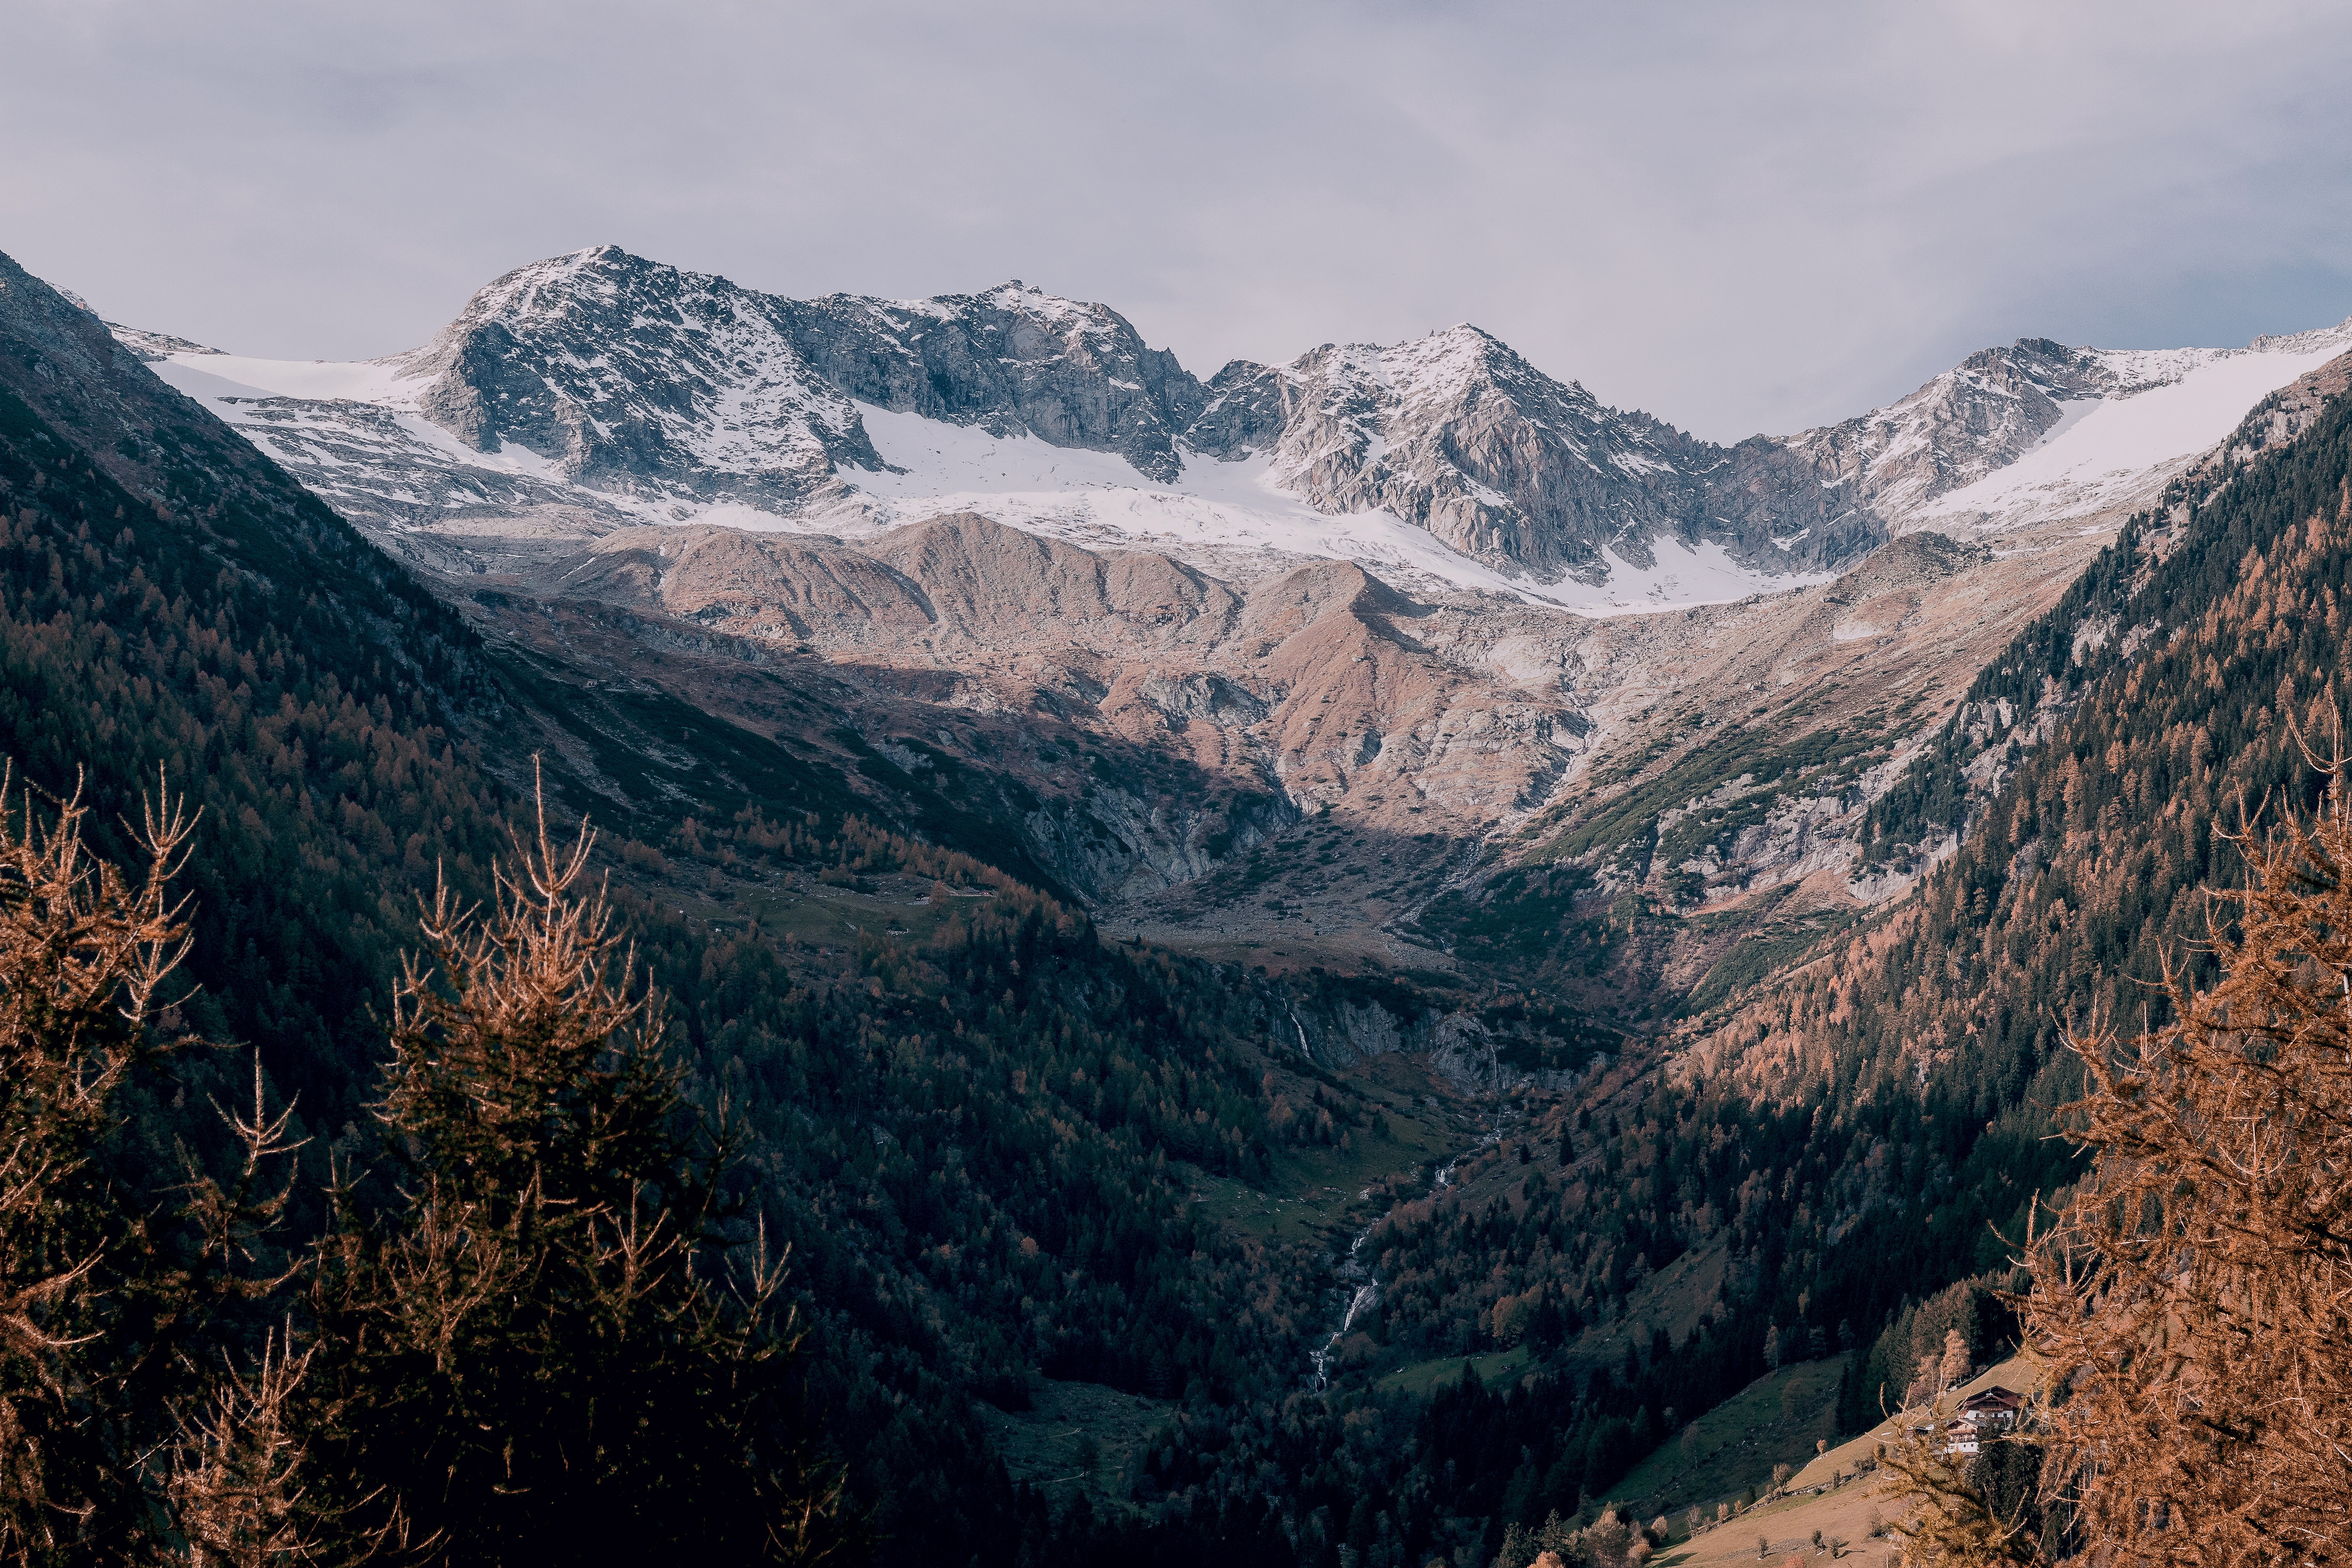 Snow-covered mountain photo